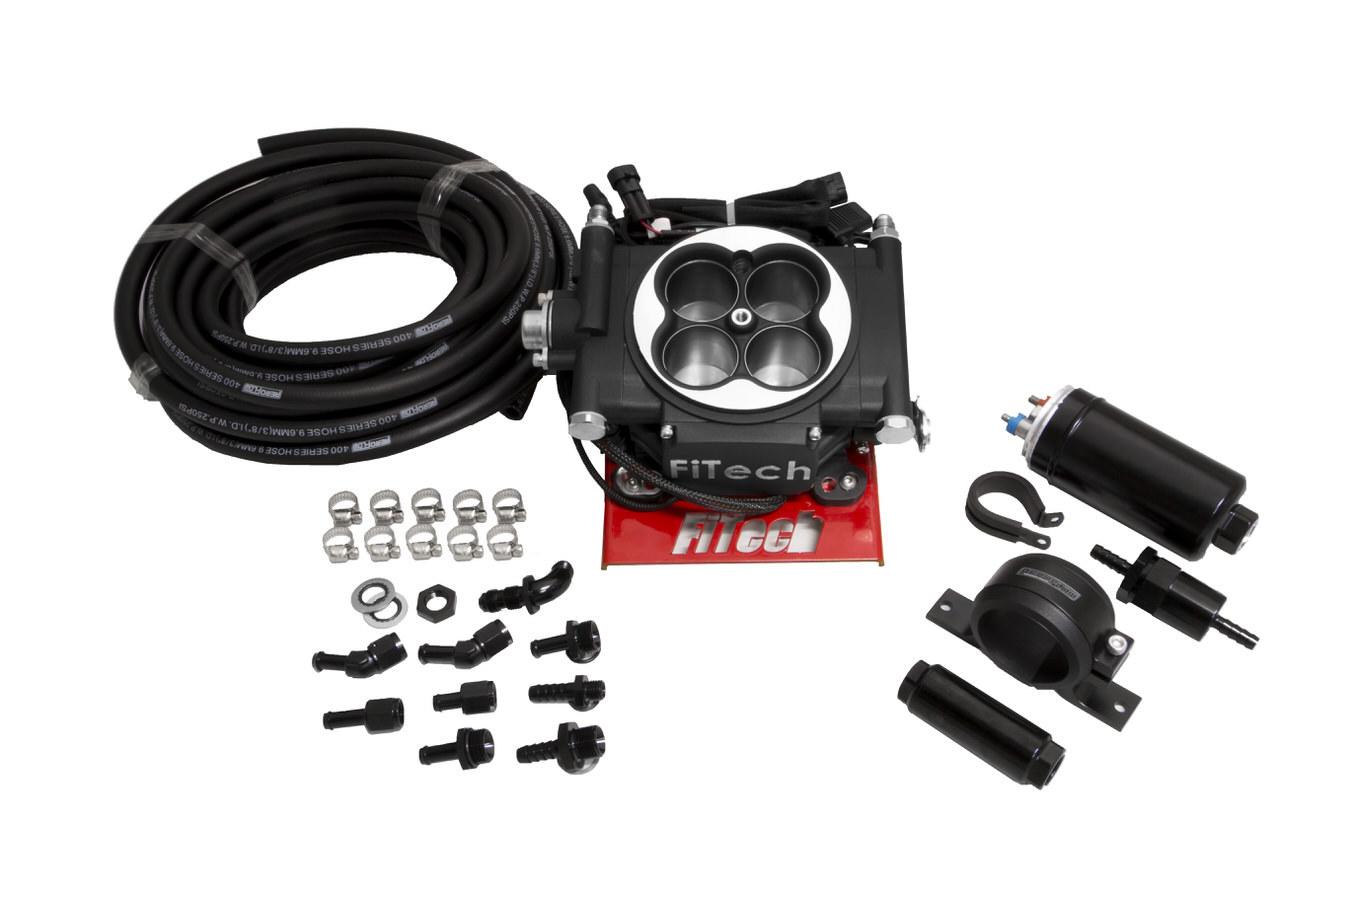 Fitech Fuel Injection Go EFI 4 Master Kit System Black Finish